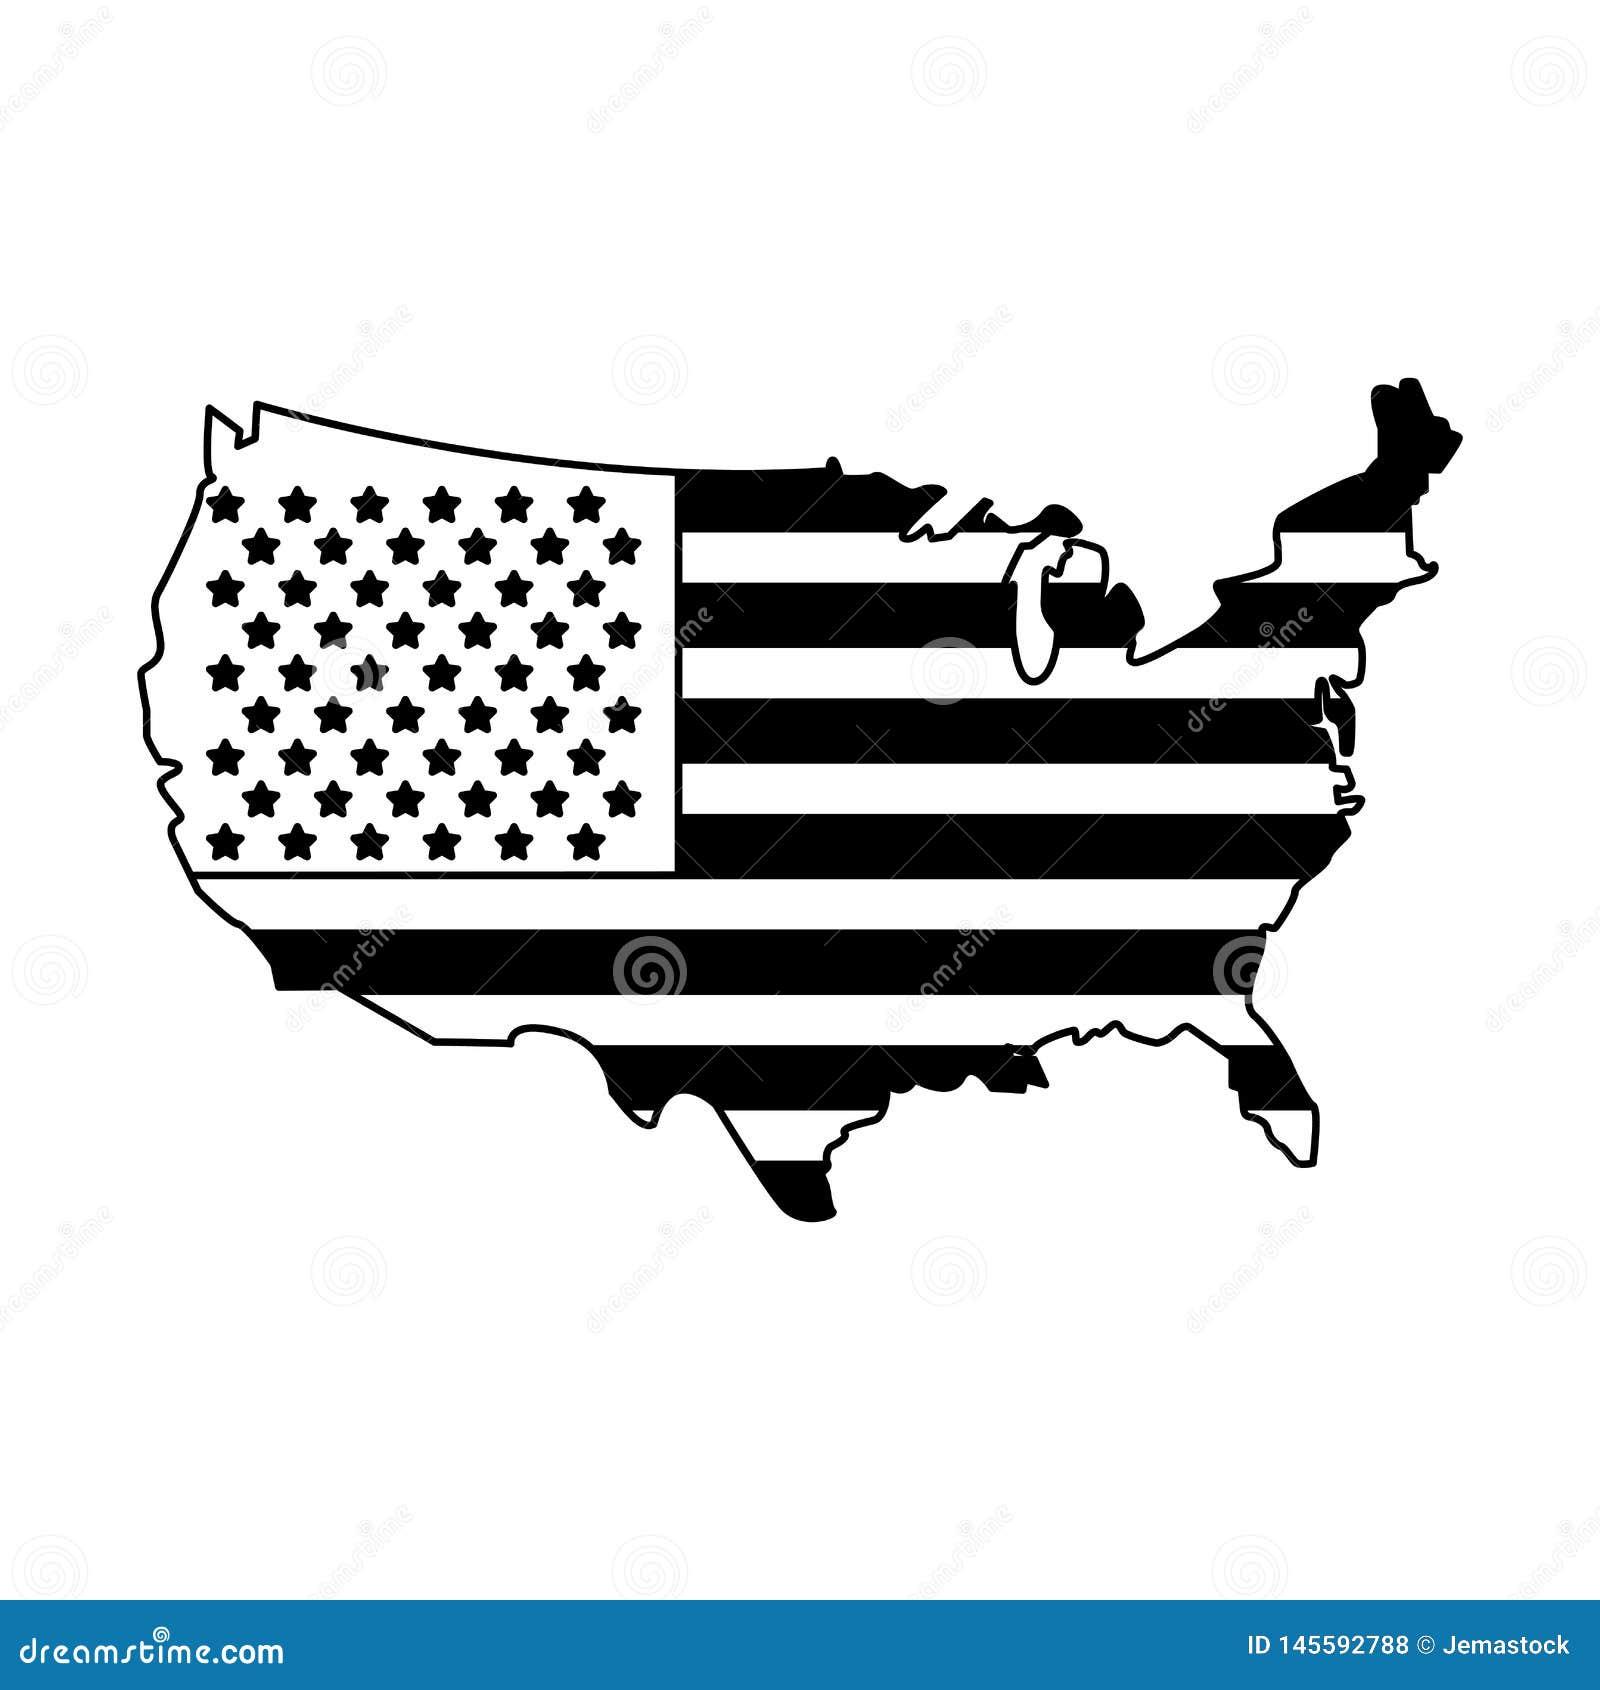 United States Map Outline Patriotic Isolated In Black And ... on black kentucky map, black ethiopia map, black panama map, black middle east map, black iowa map, us civil war railroad map, black western hemisphere map, black oklahoma map, black alaska map, black countries map, black north carolina, black germany map, black indiana map, black ghana map, african american population by state map, black globe, black france map, black idaho map, geothermal energy heat map, black michigan map,